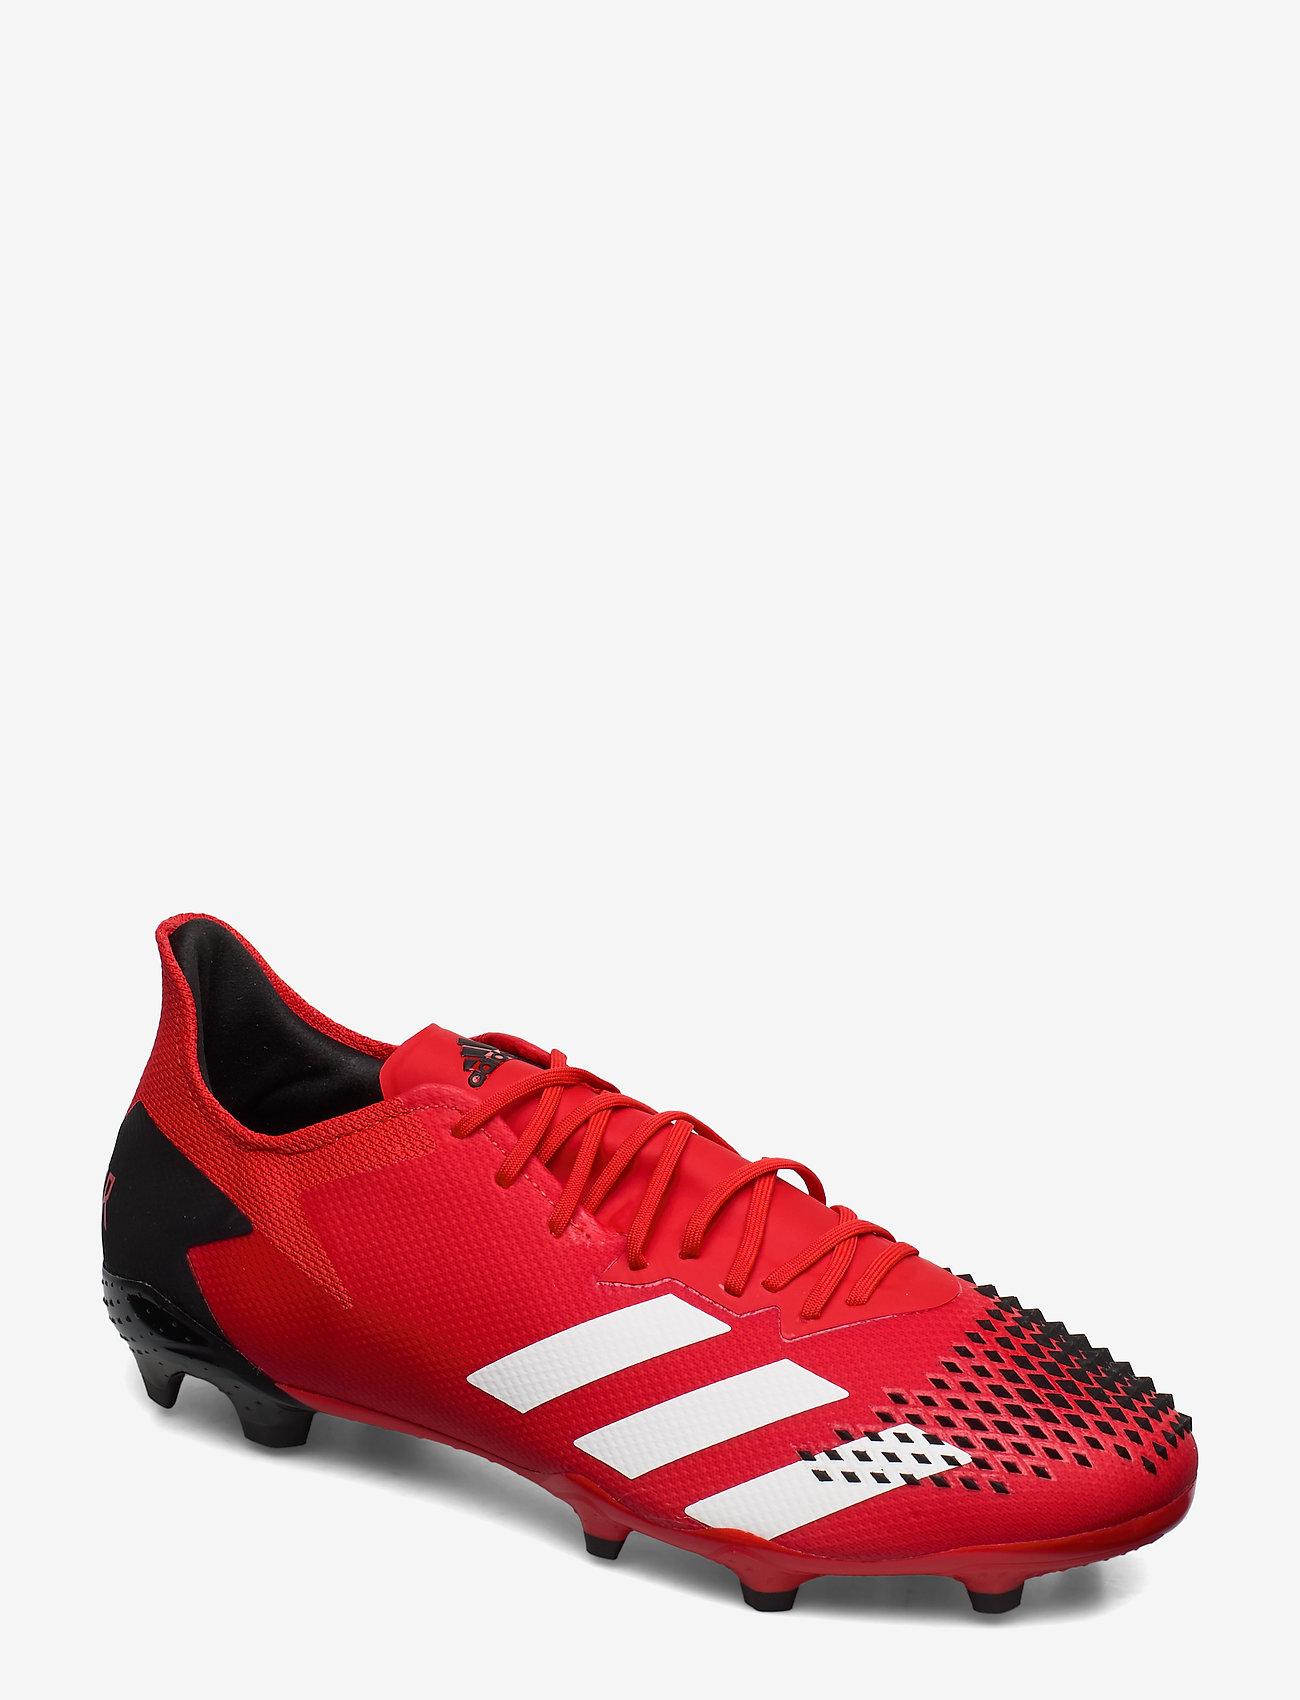 adidas Performance - PREDATOR 20.2 FG - jalkapallokengät - actred/ftwwht/cblack - 0